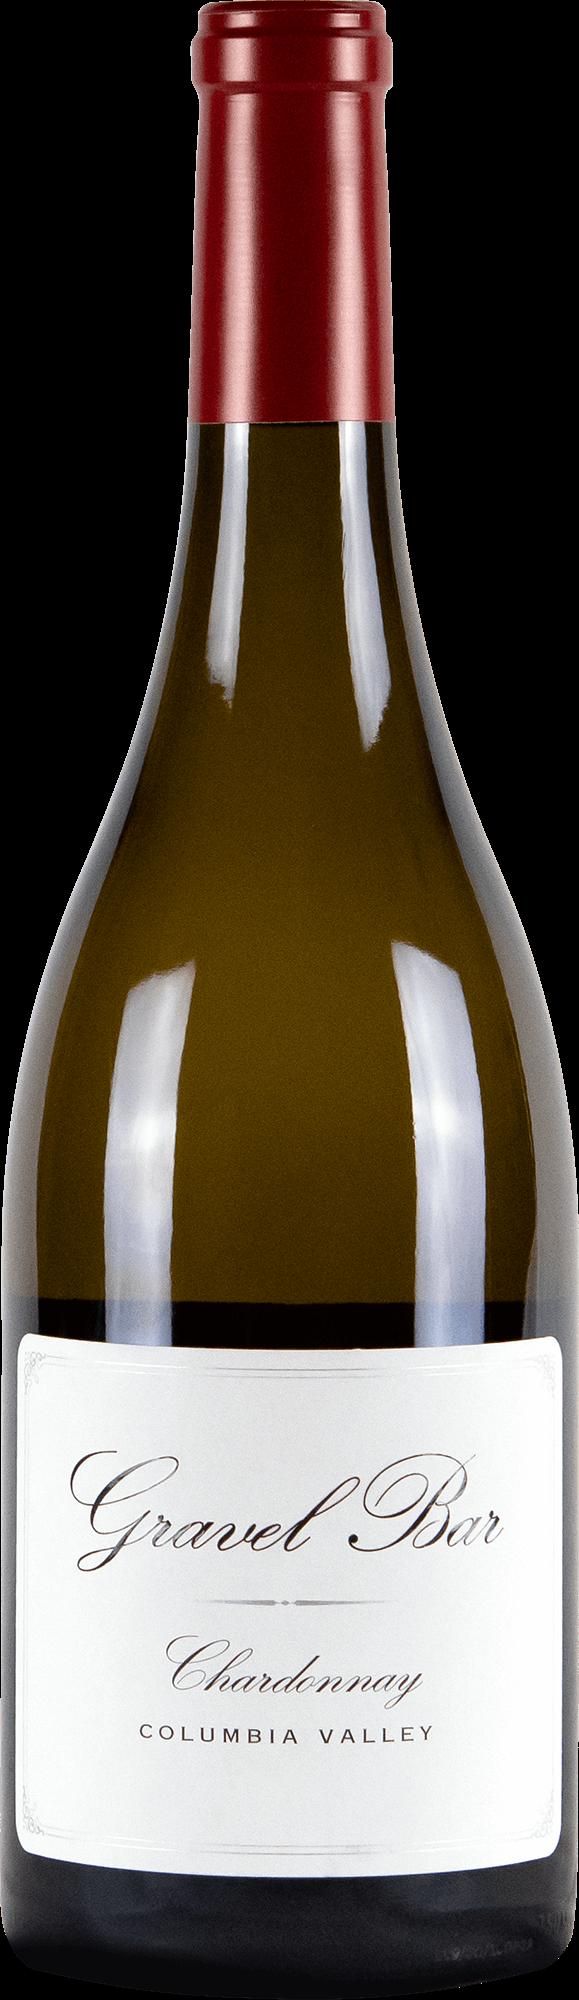 Gravel Bar Chardonnay Bottleshot